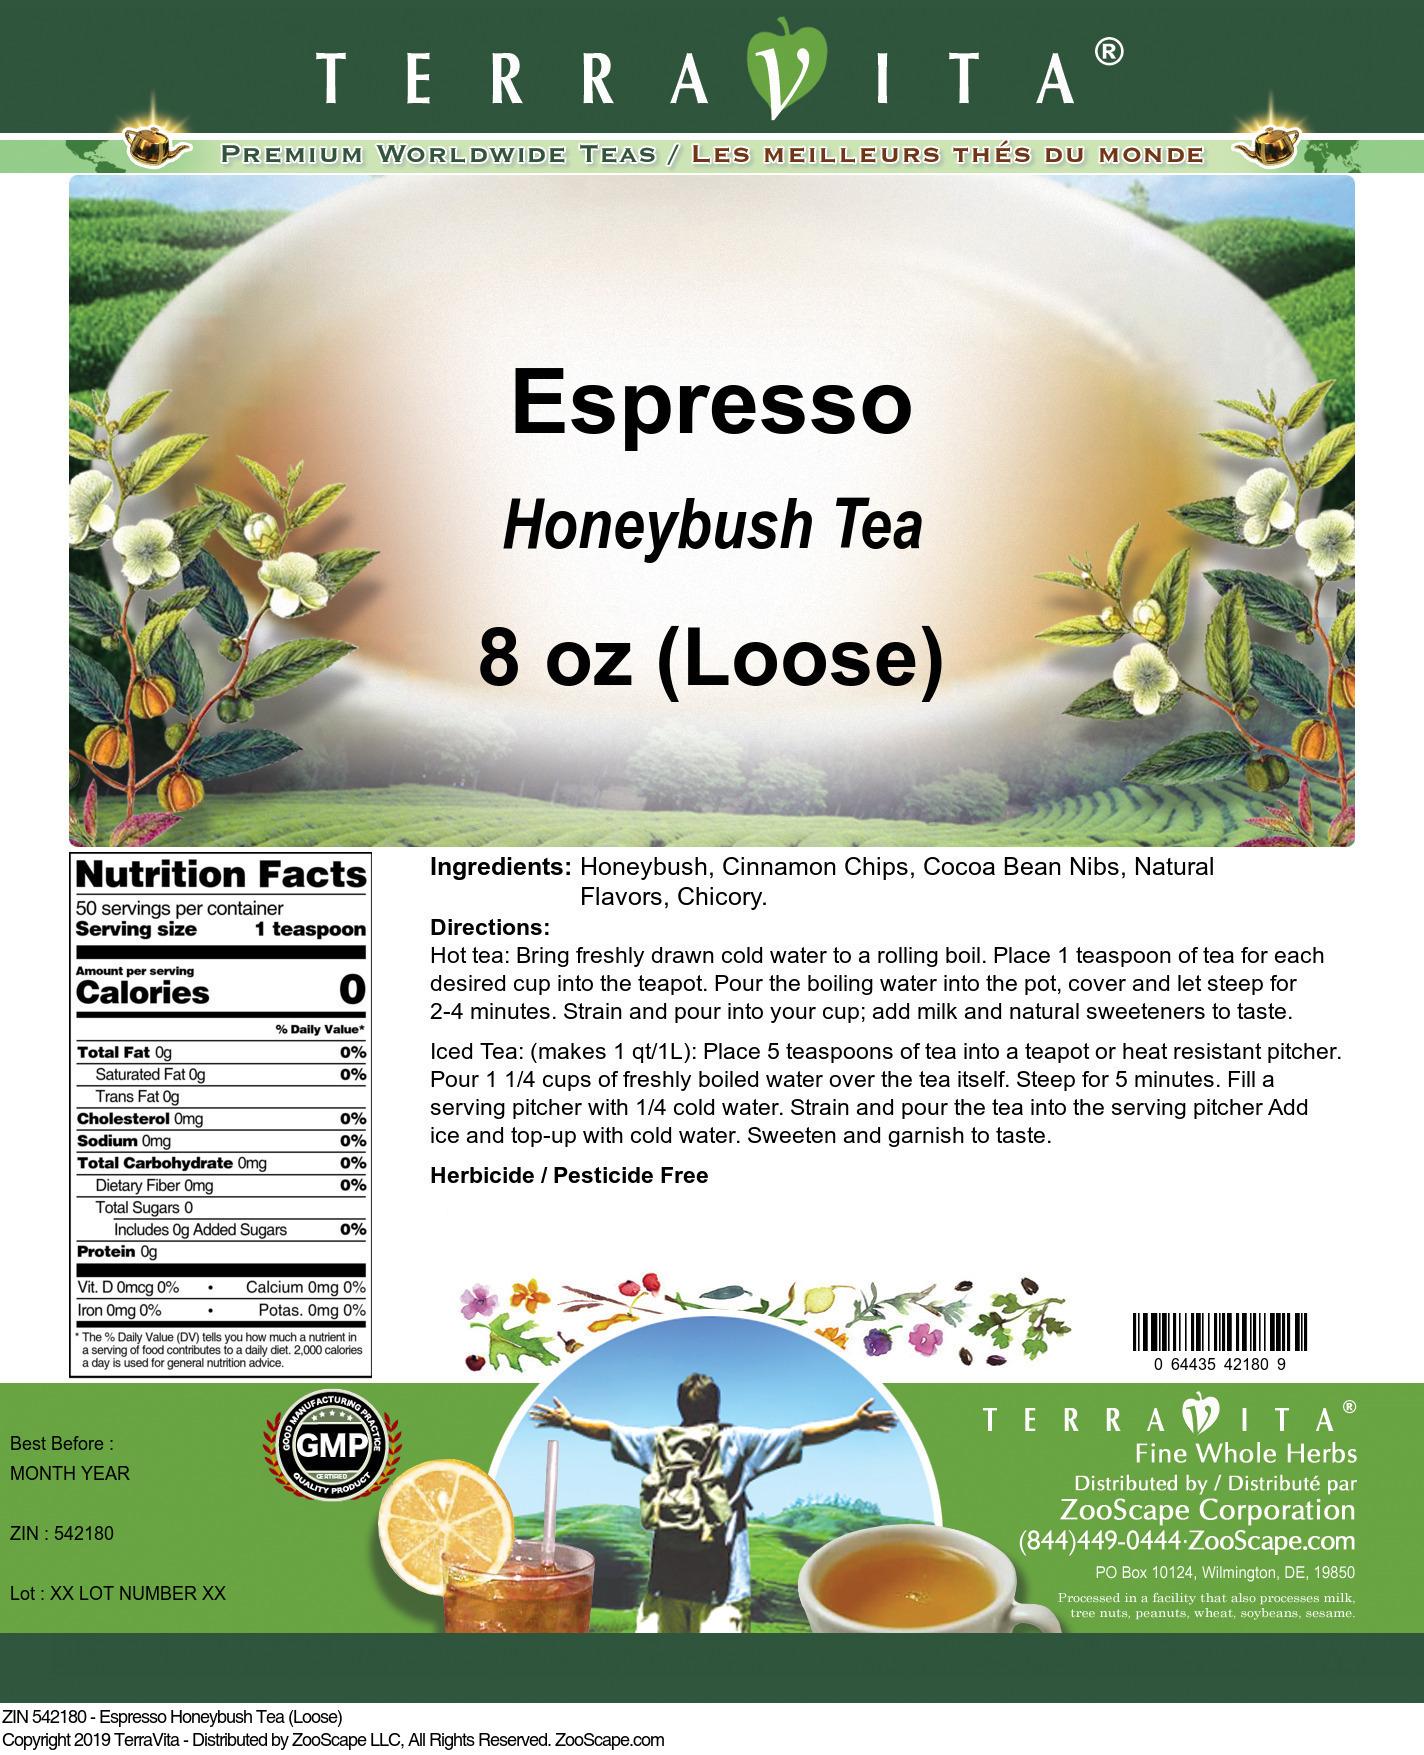 Espresso Honeybush Tea (Loose)